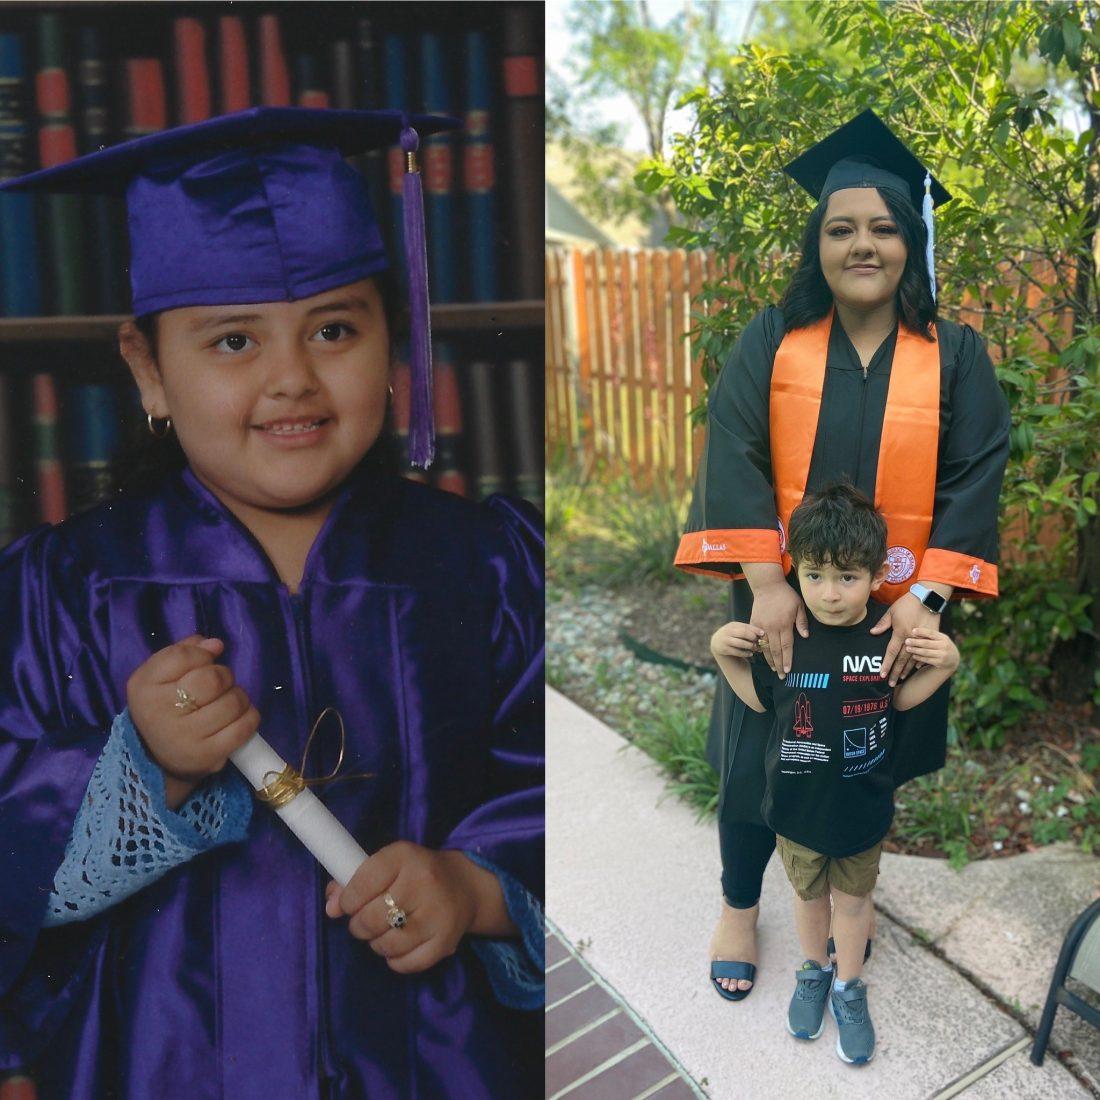 Lizeth Alvarez at her preschool graduation